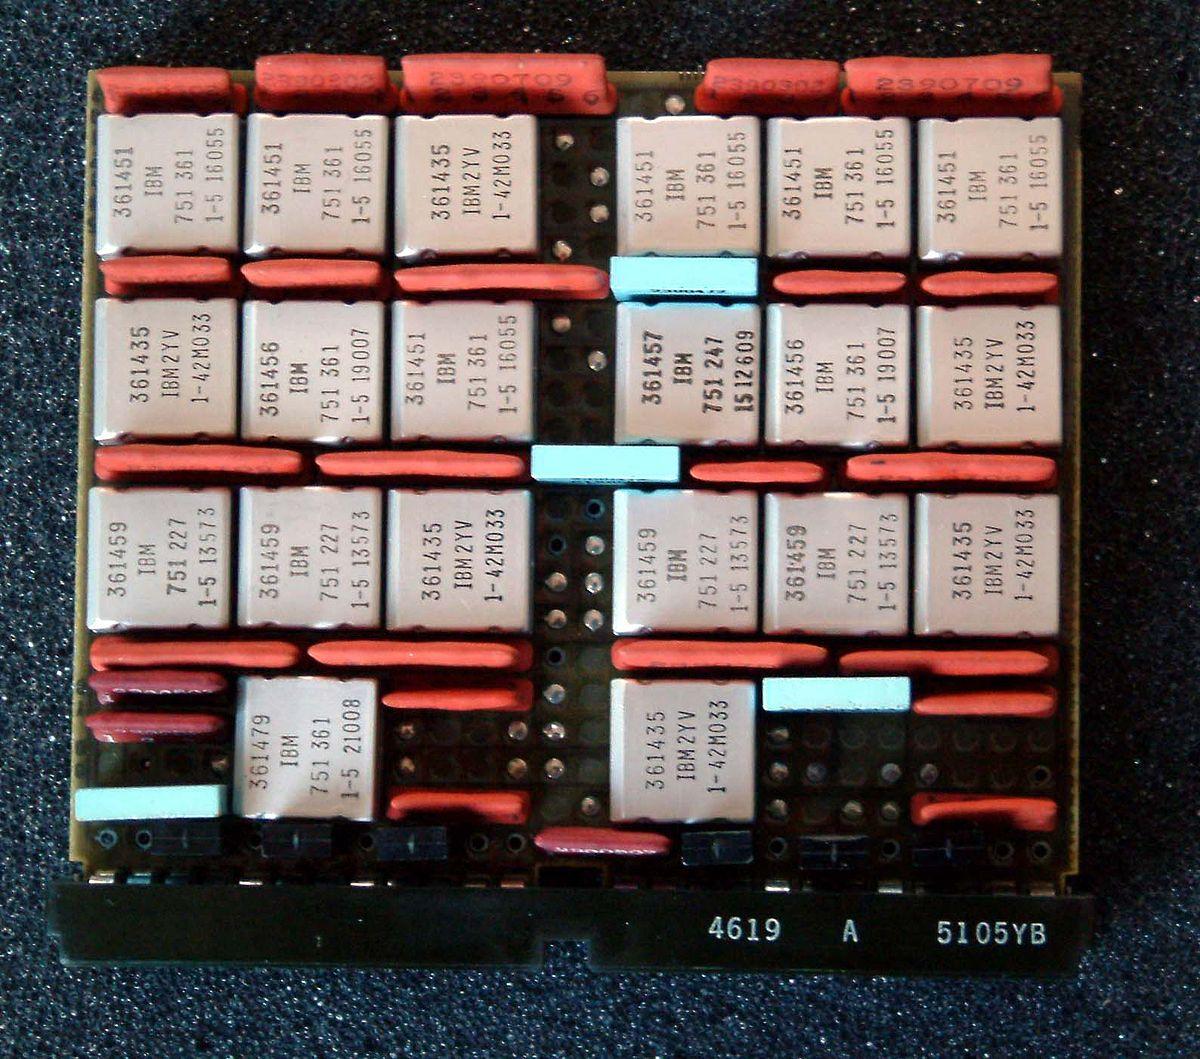 Ibm Solid Logic Technology Wikipedia Electronic Circuit Design Quiz